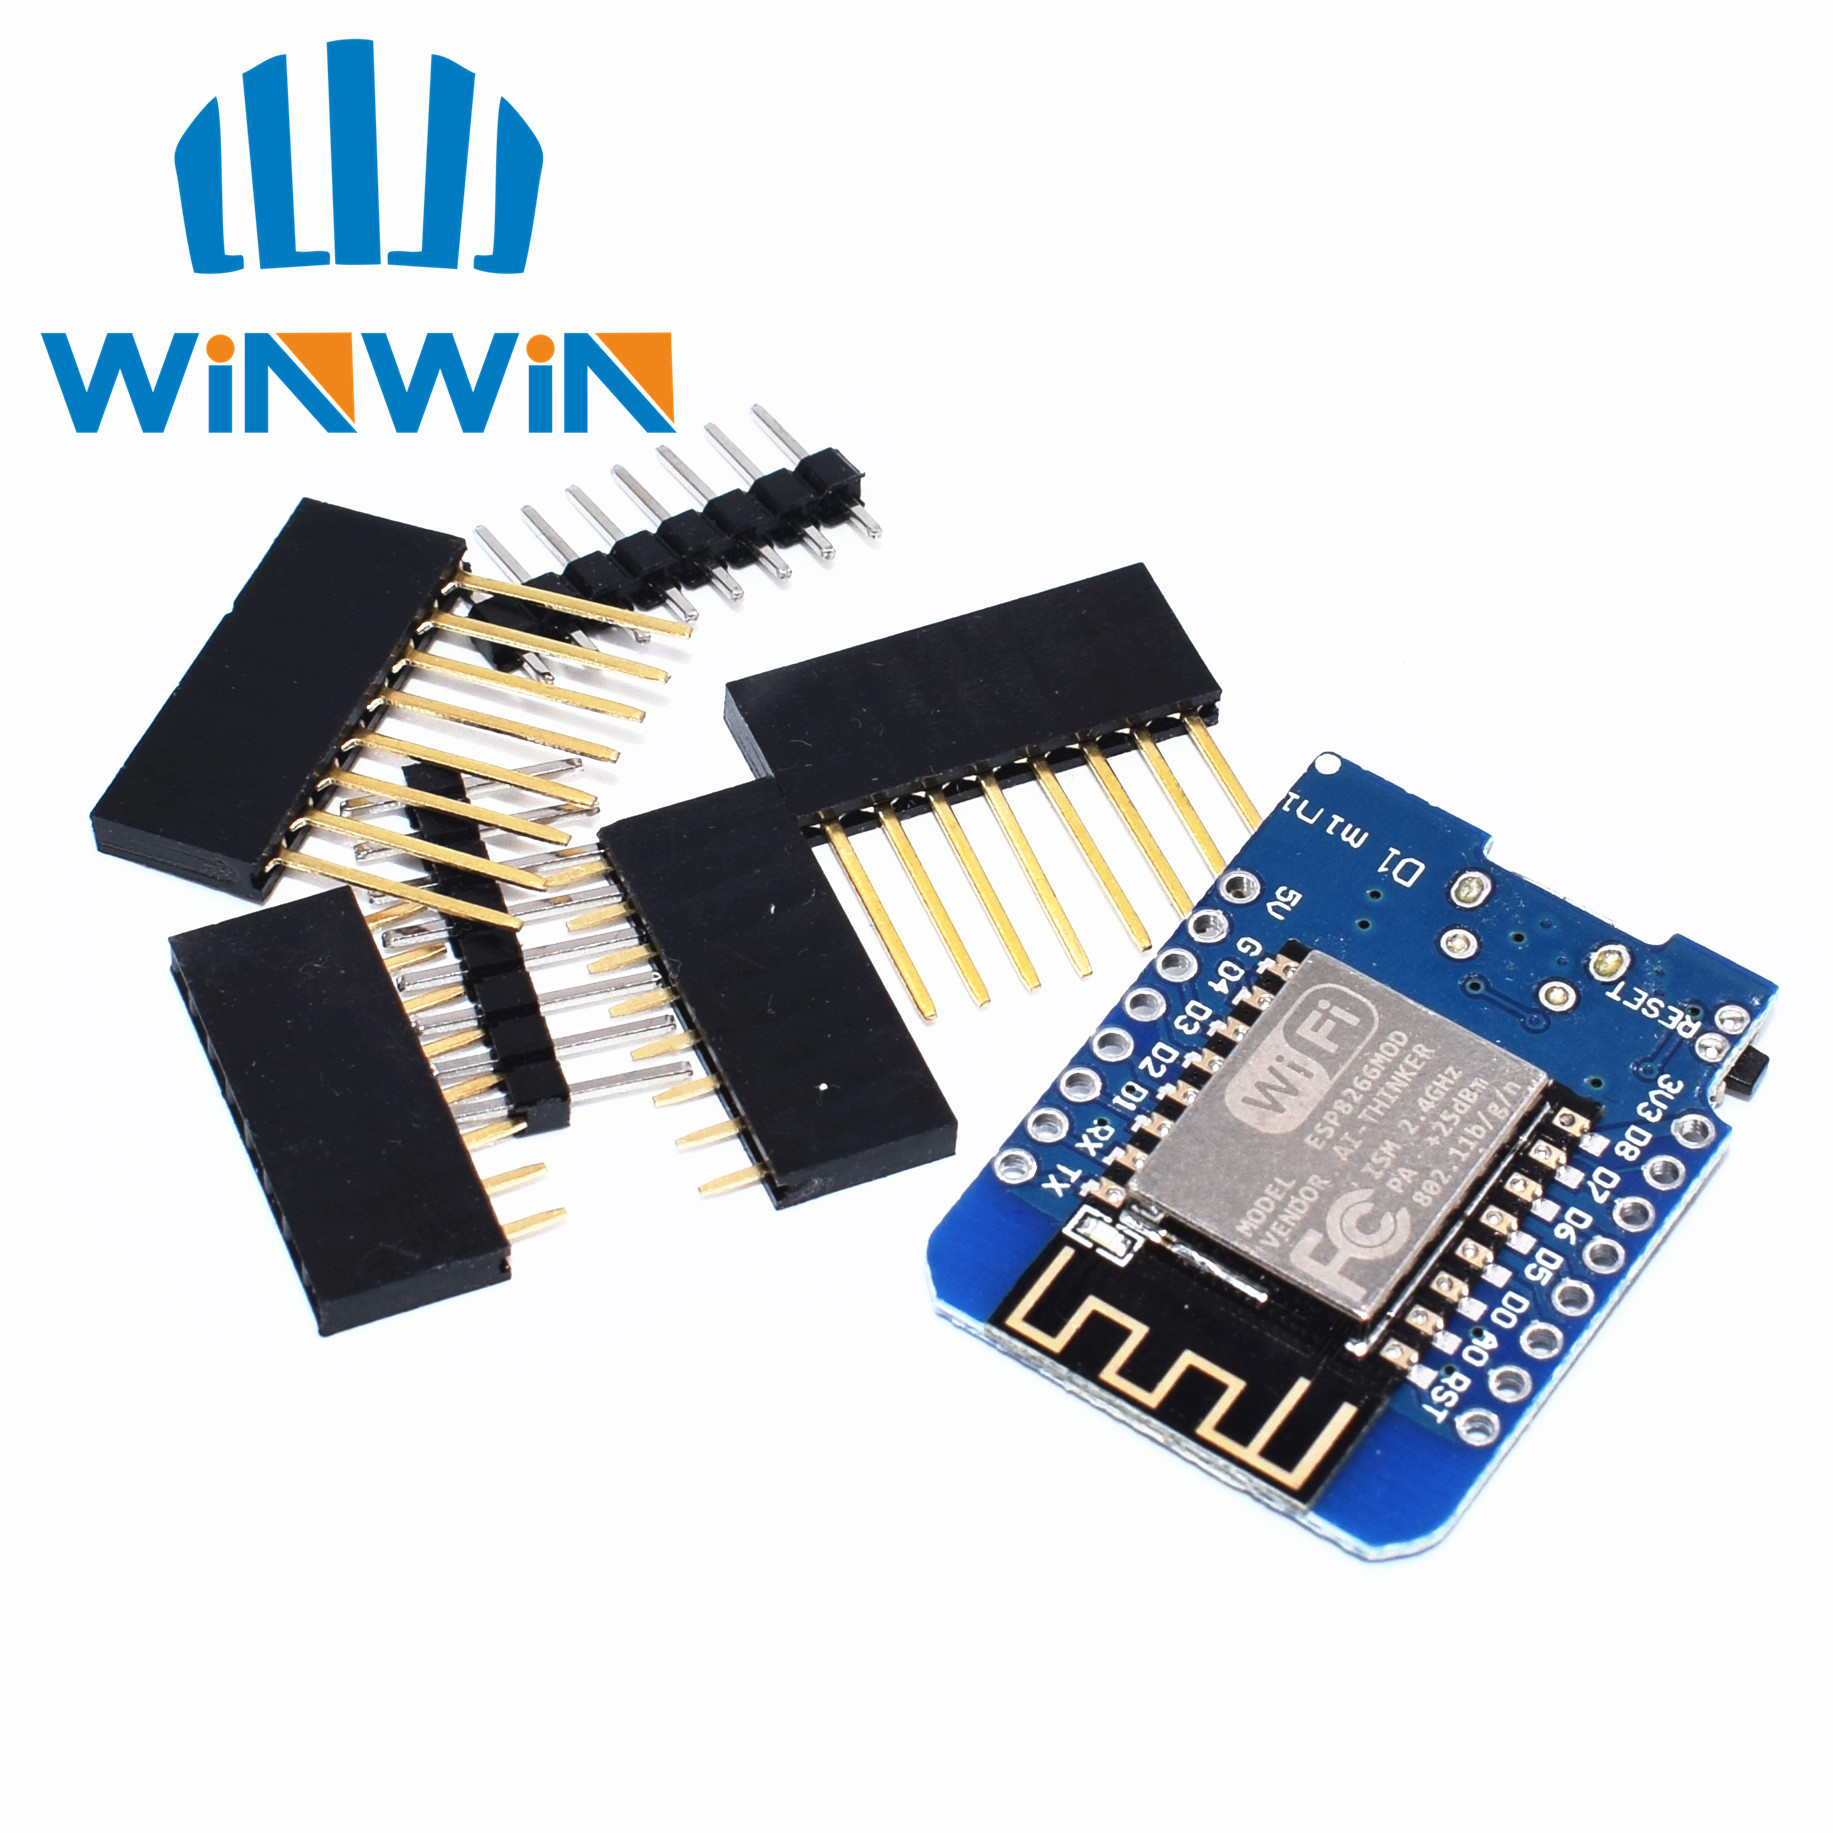 ESP8266 ESP-12 ESP-12F CH340G CH340 V2 USB WeMos D1 Mini WIFI Development Board D1 Mini NodeMCU Lua IOT Board 3.3V With PinsESP8266 ESP-12 ESP-12F CH340G CH340 V2 USB WeMos D1 Mini WIFI Development Board D1 Mini NodeMCU Lua IOT Board 3.3V With Pins